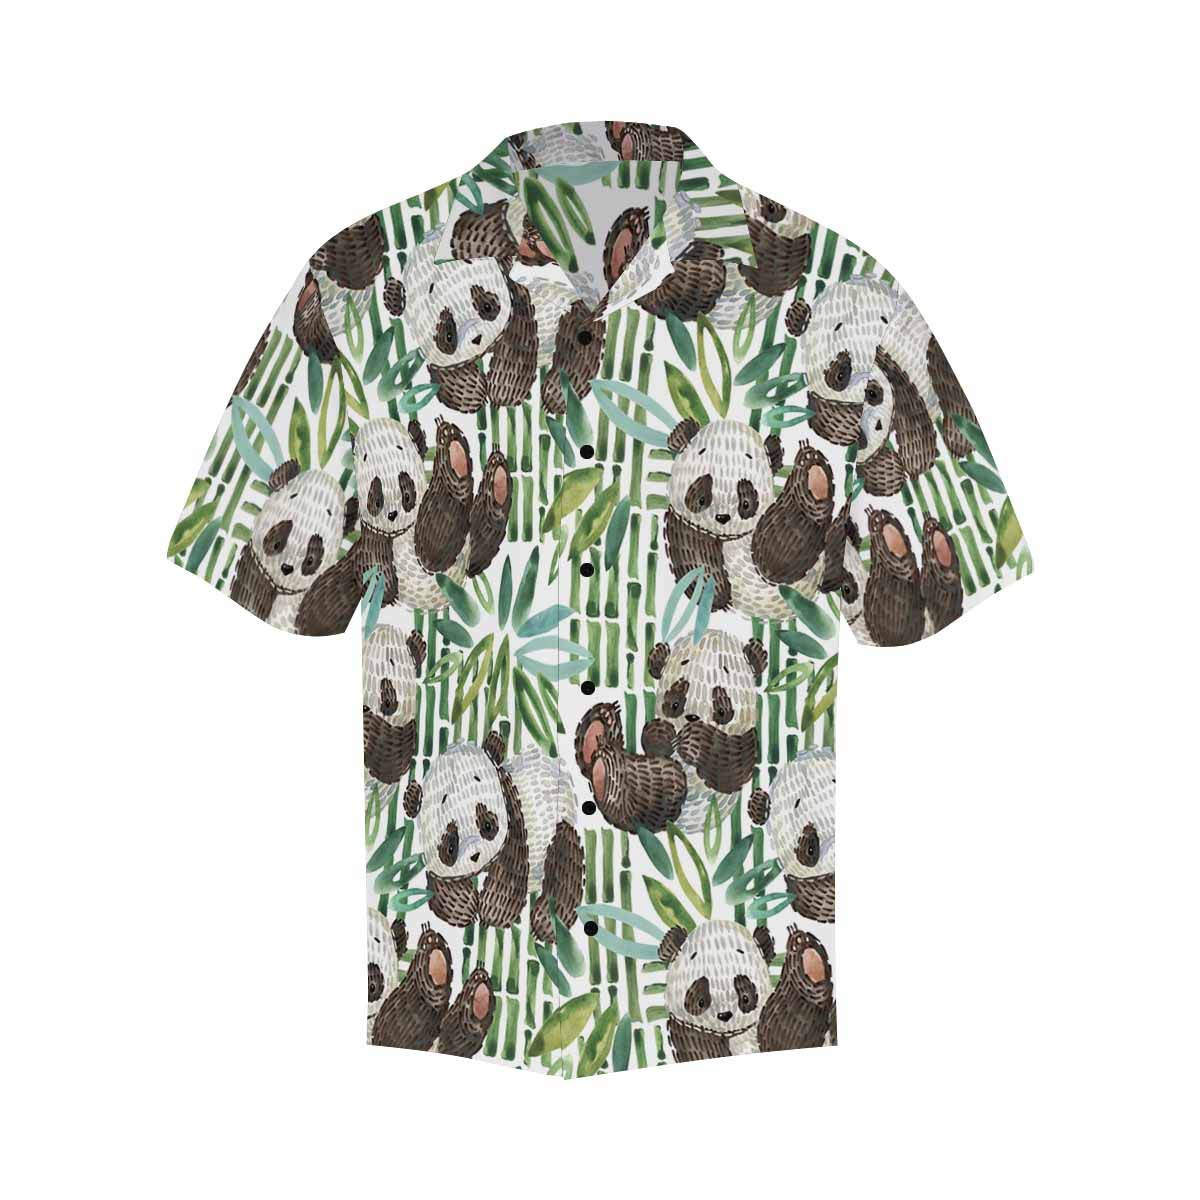 InterestPrint Mens Watercolor Clover Tees Tops T-Shirts